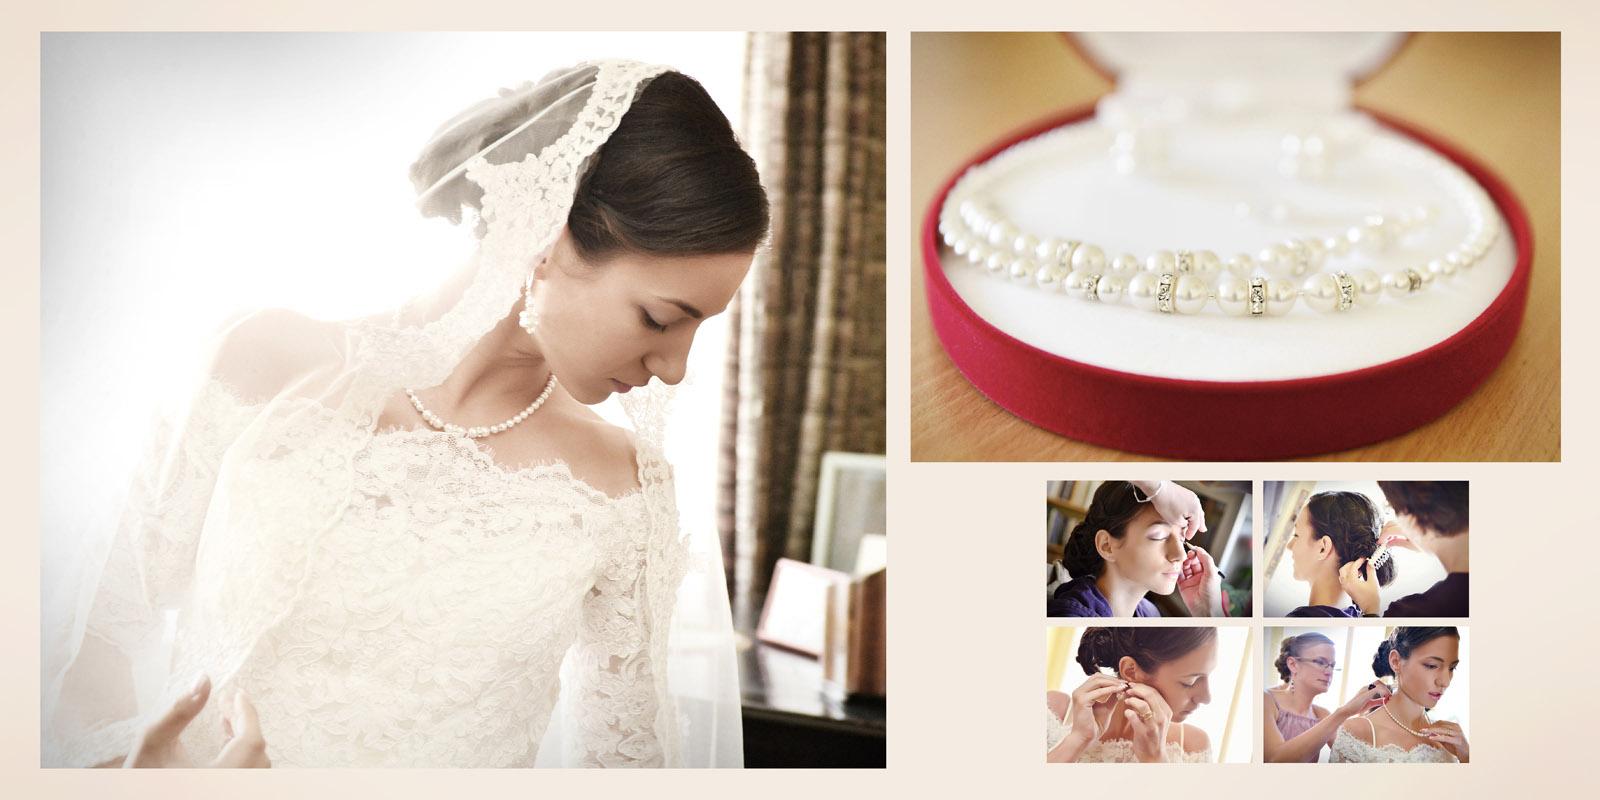 detalii cu pregatirea miresei pentru nunta, aranjate in pagina simplu si elegant